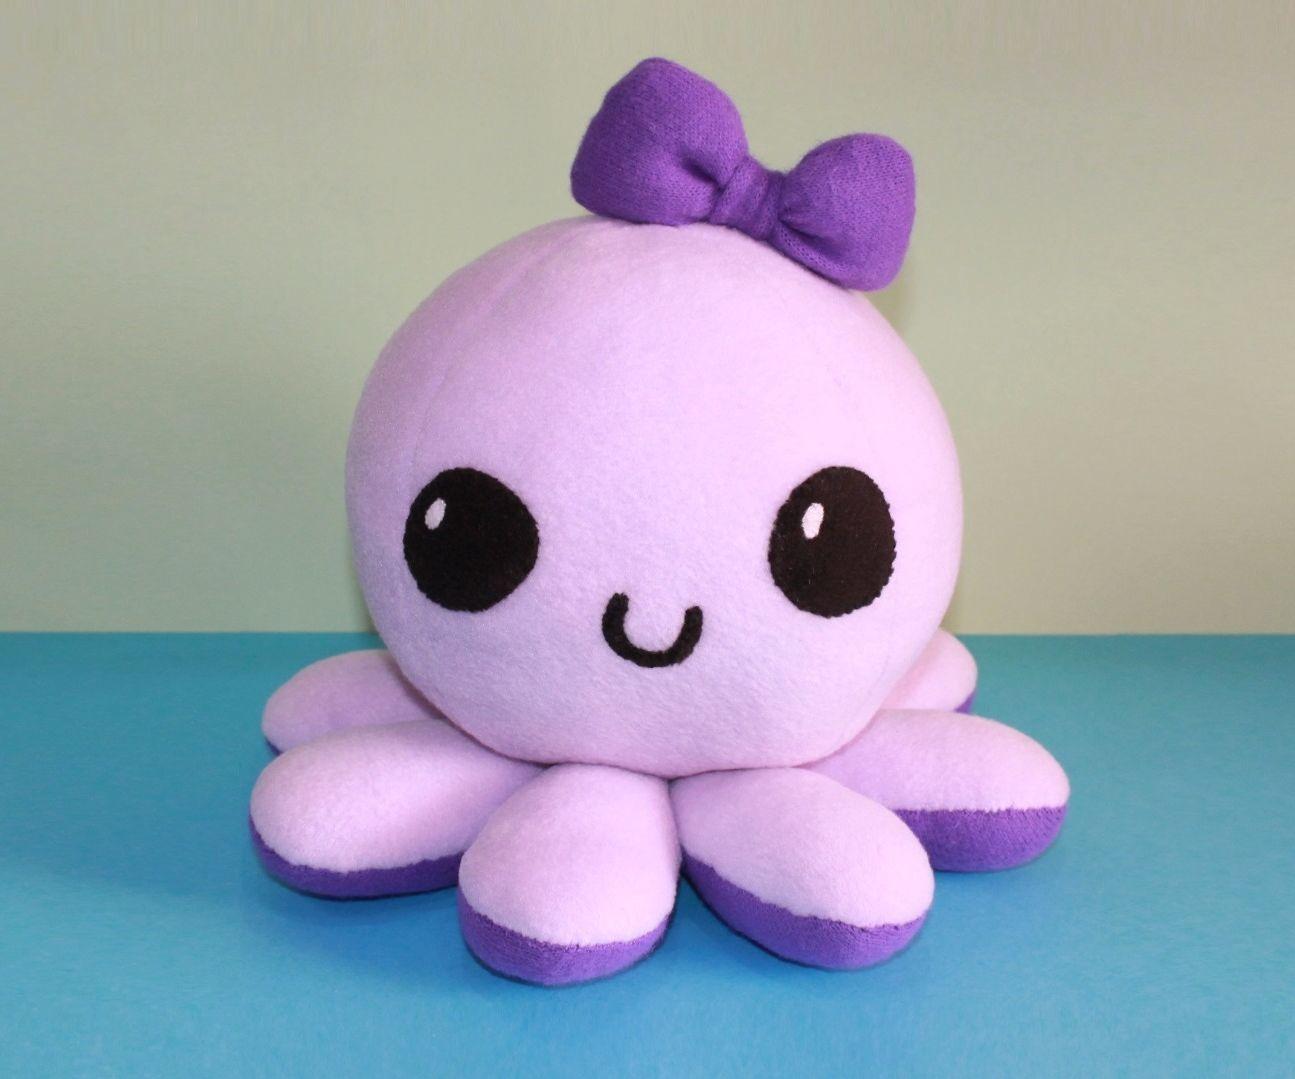 Kawaii octopus plushie template by sewingplush2point0. Deviantart.